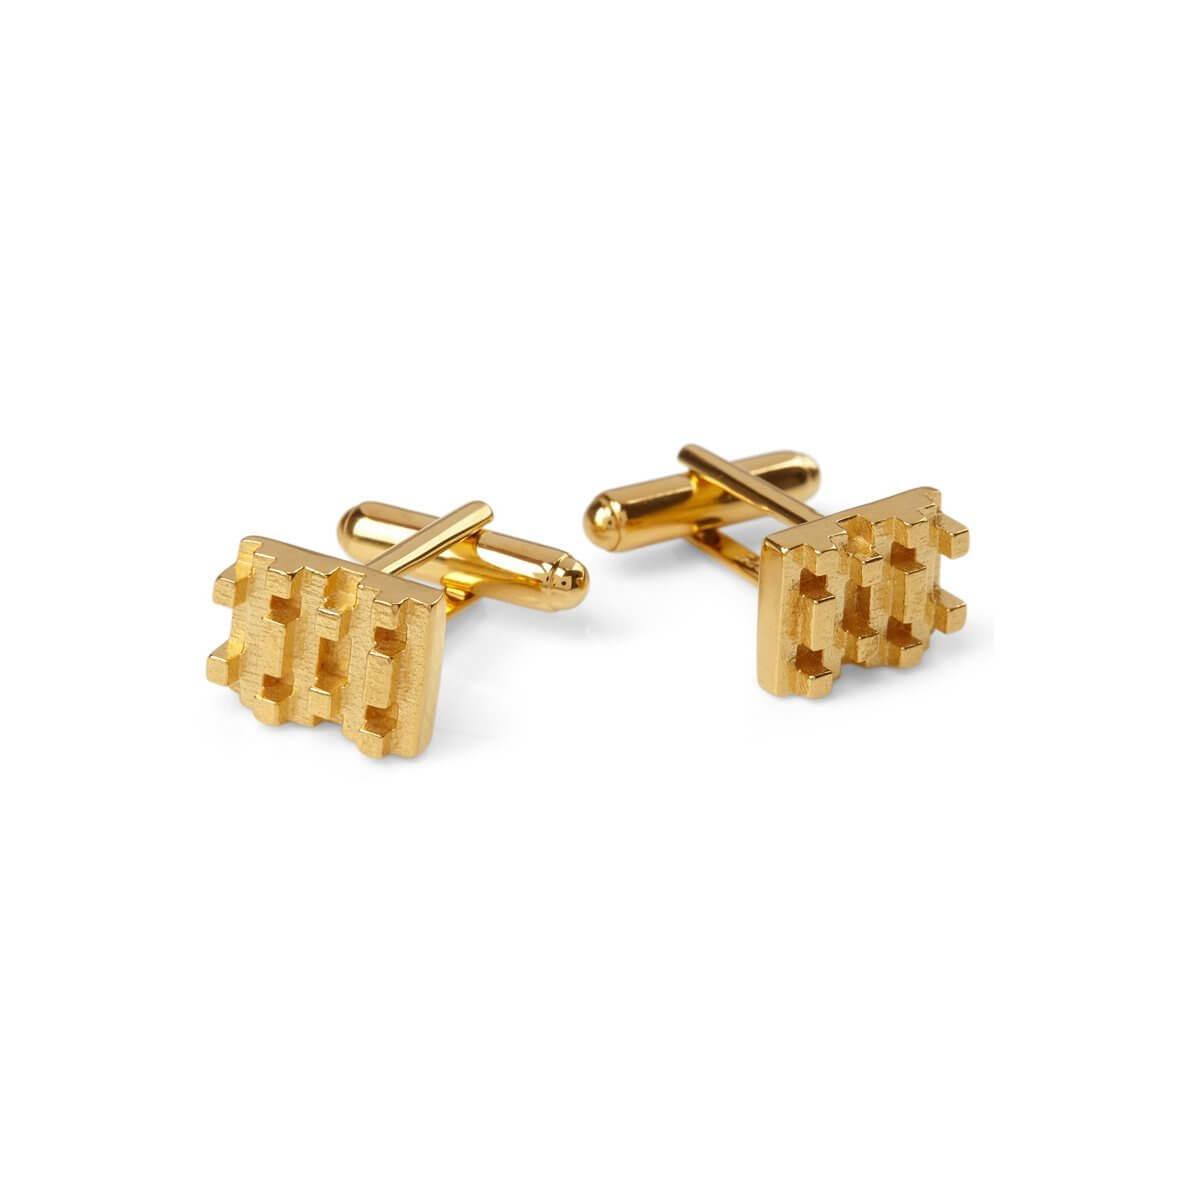 Hive lego cufflinks 18ct Gold Vermeil